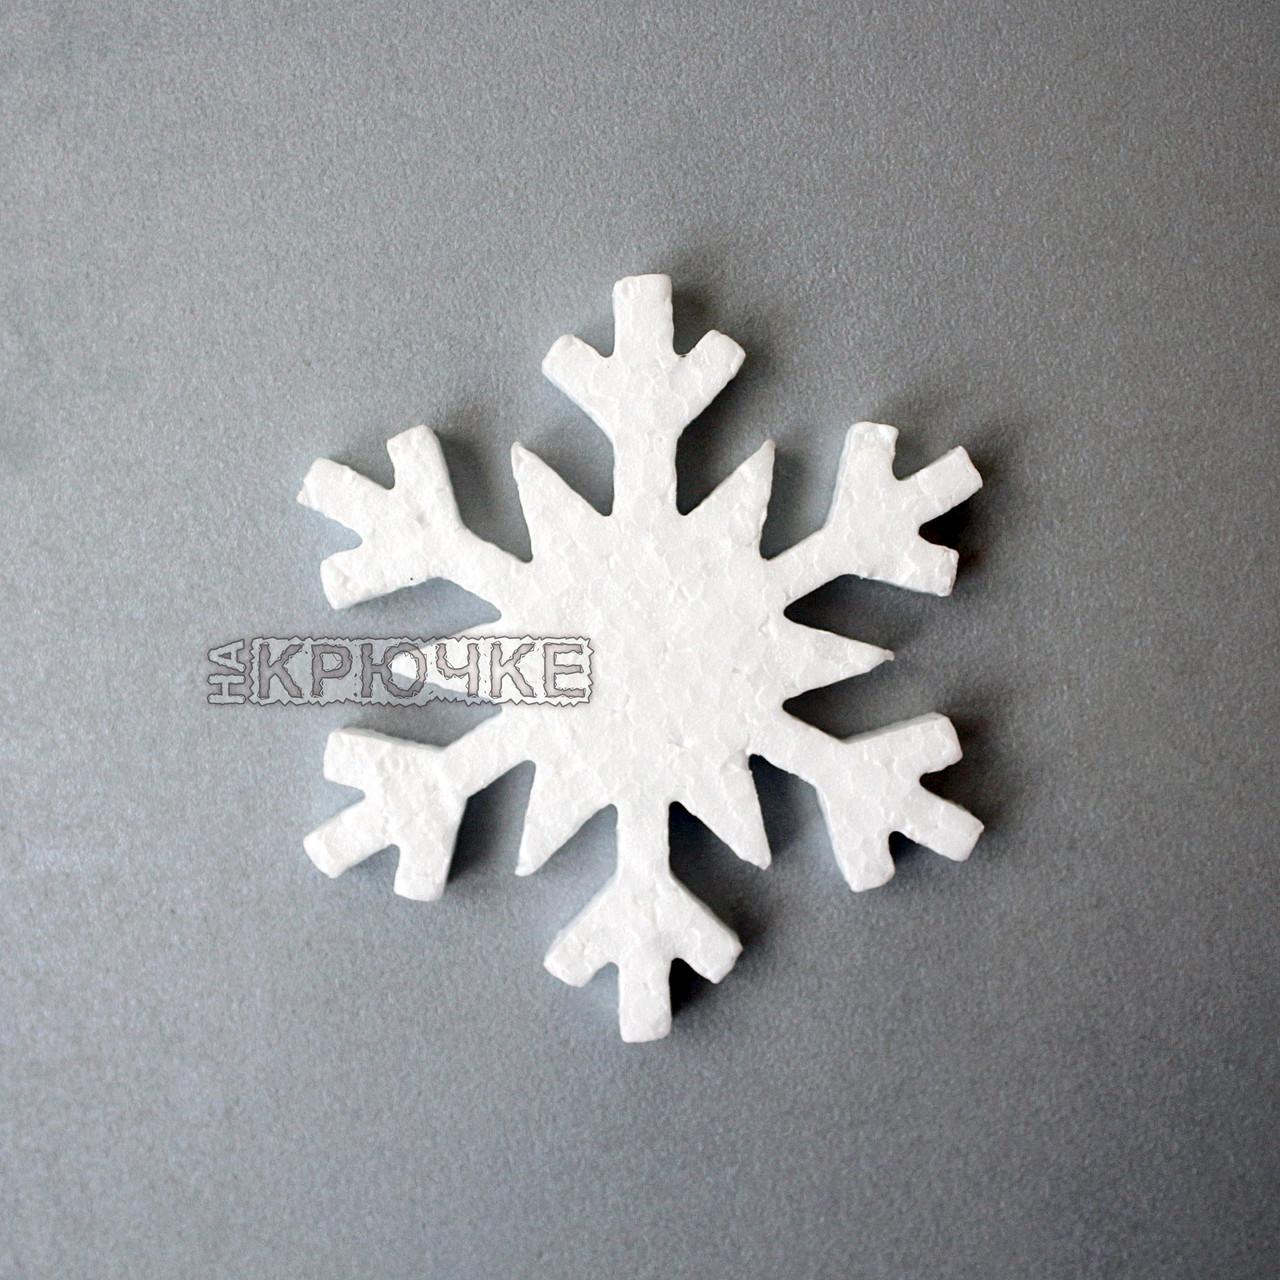 Пенопластовые снежинки №5, 250х20 мм